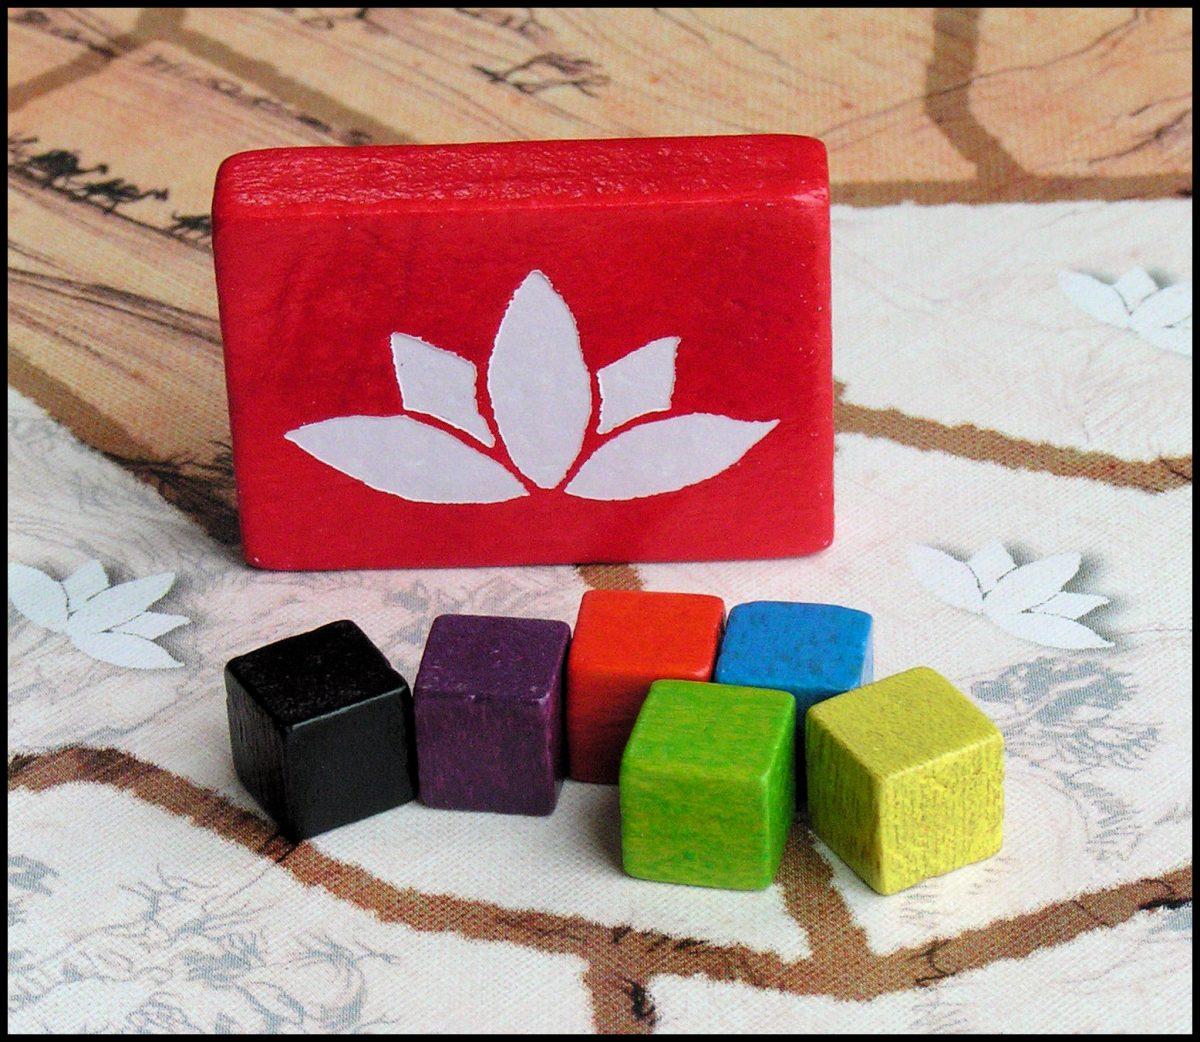 Der Weisse Lotus - White Lotus And Player Cubes